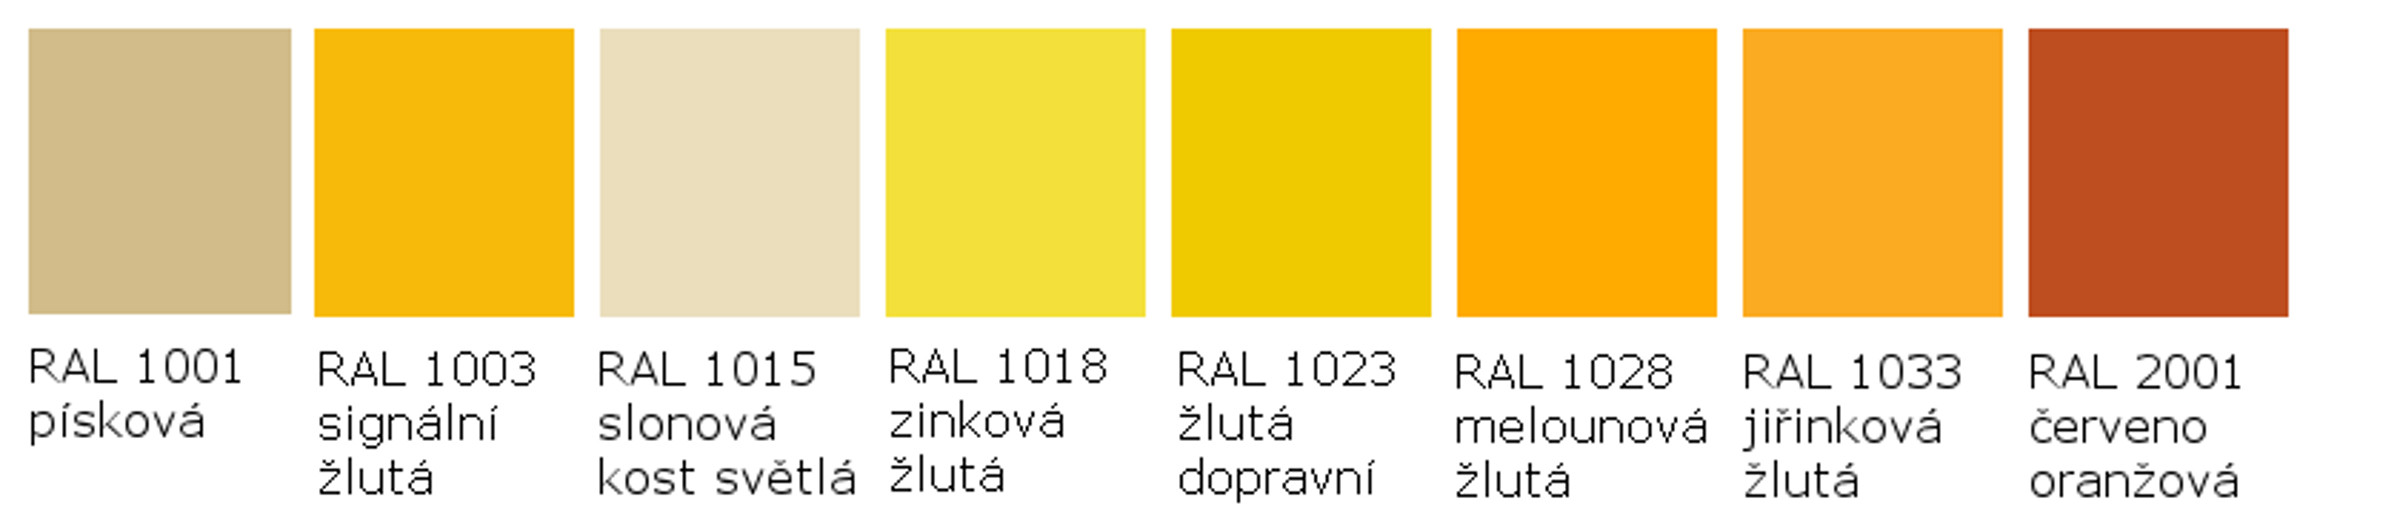 RAL 1001 - RAL 2001